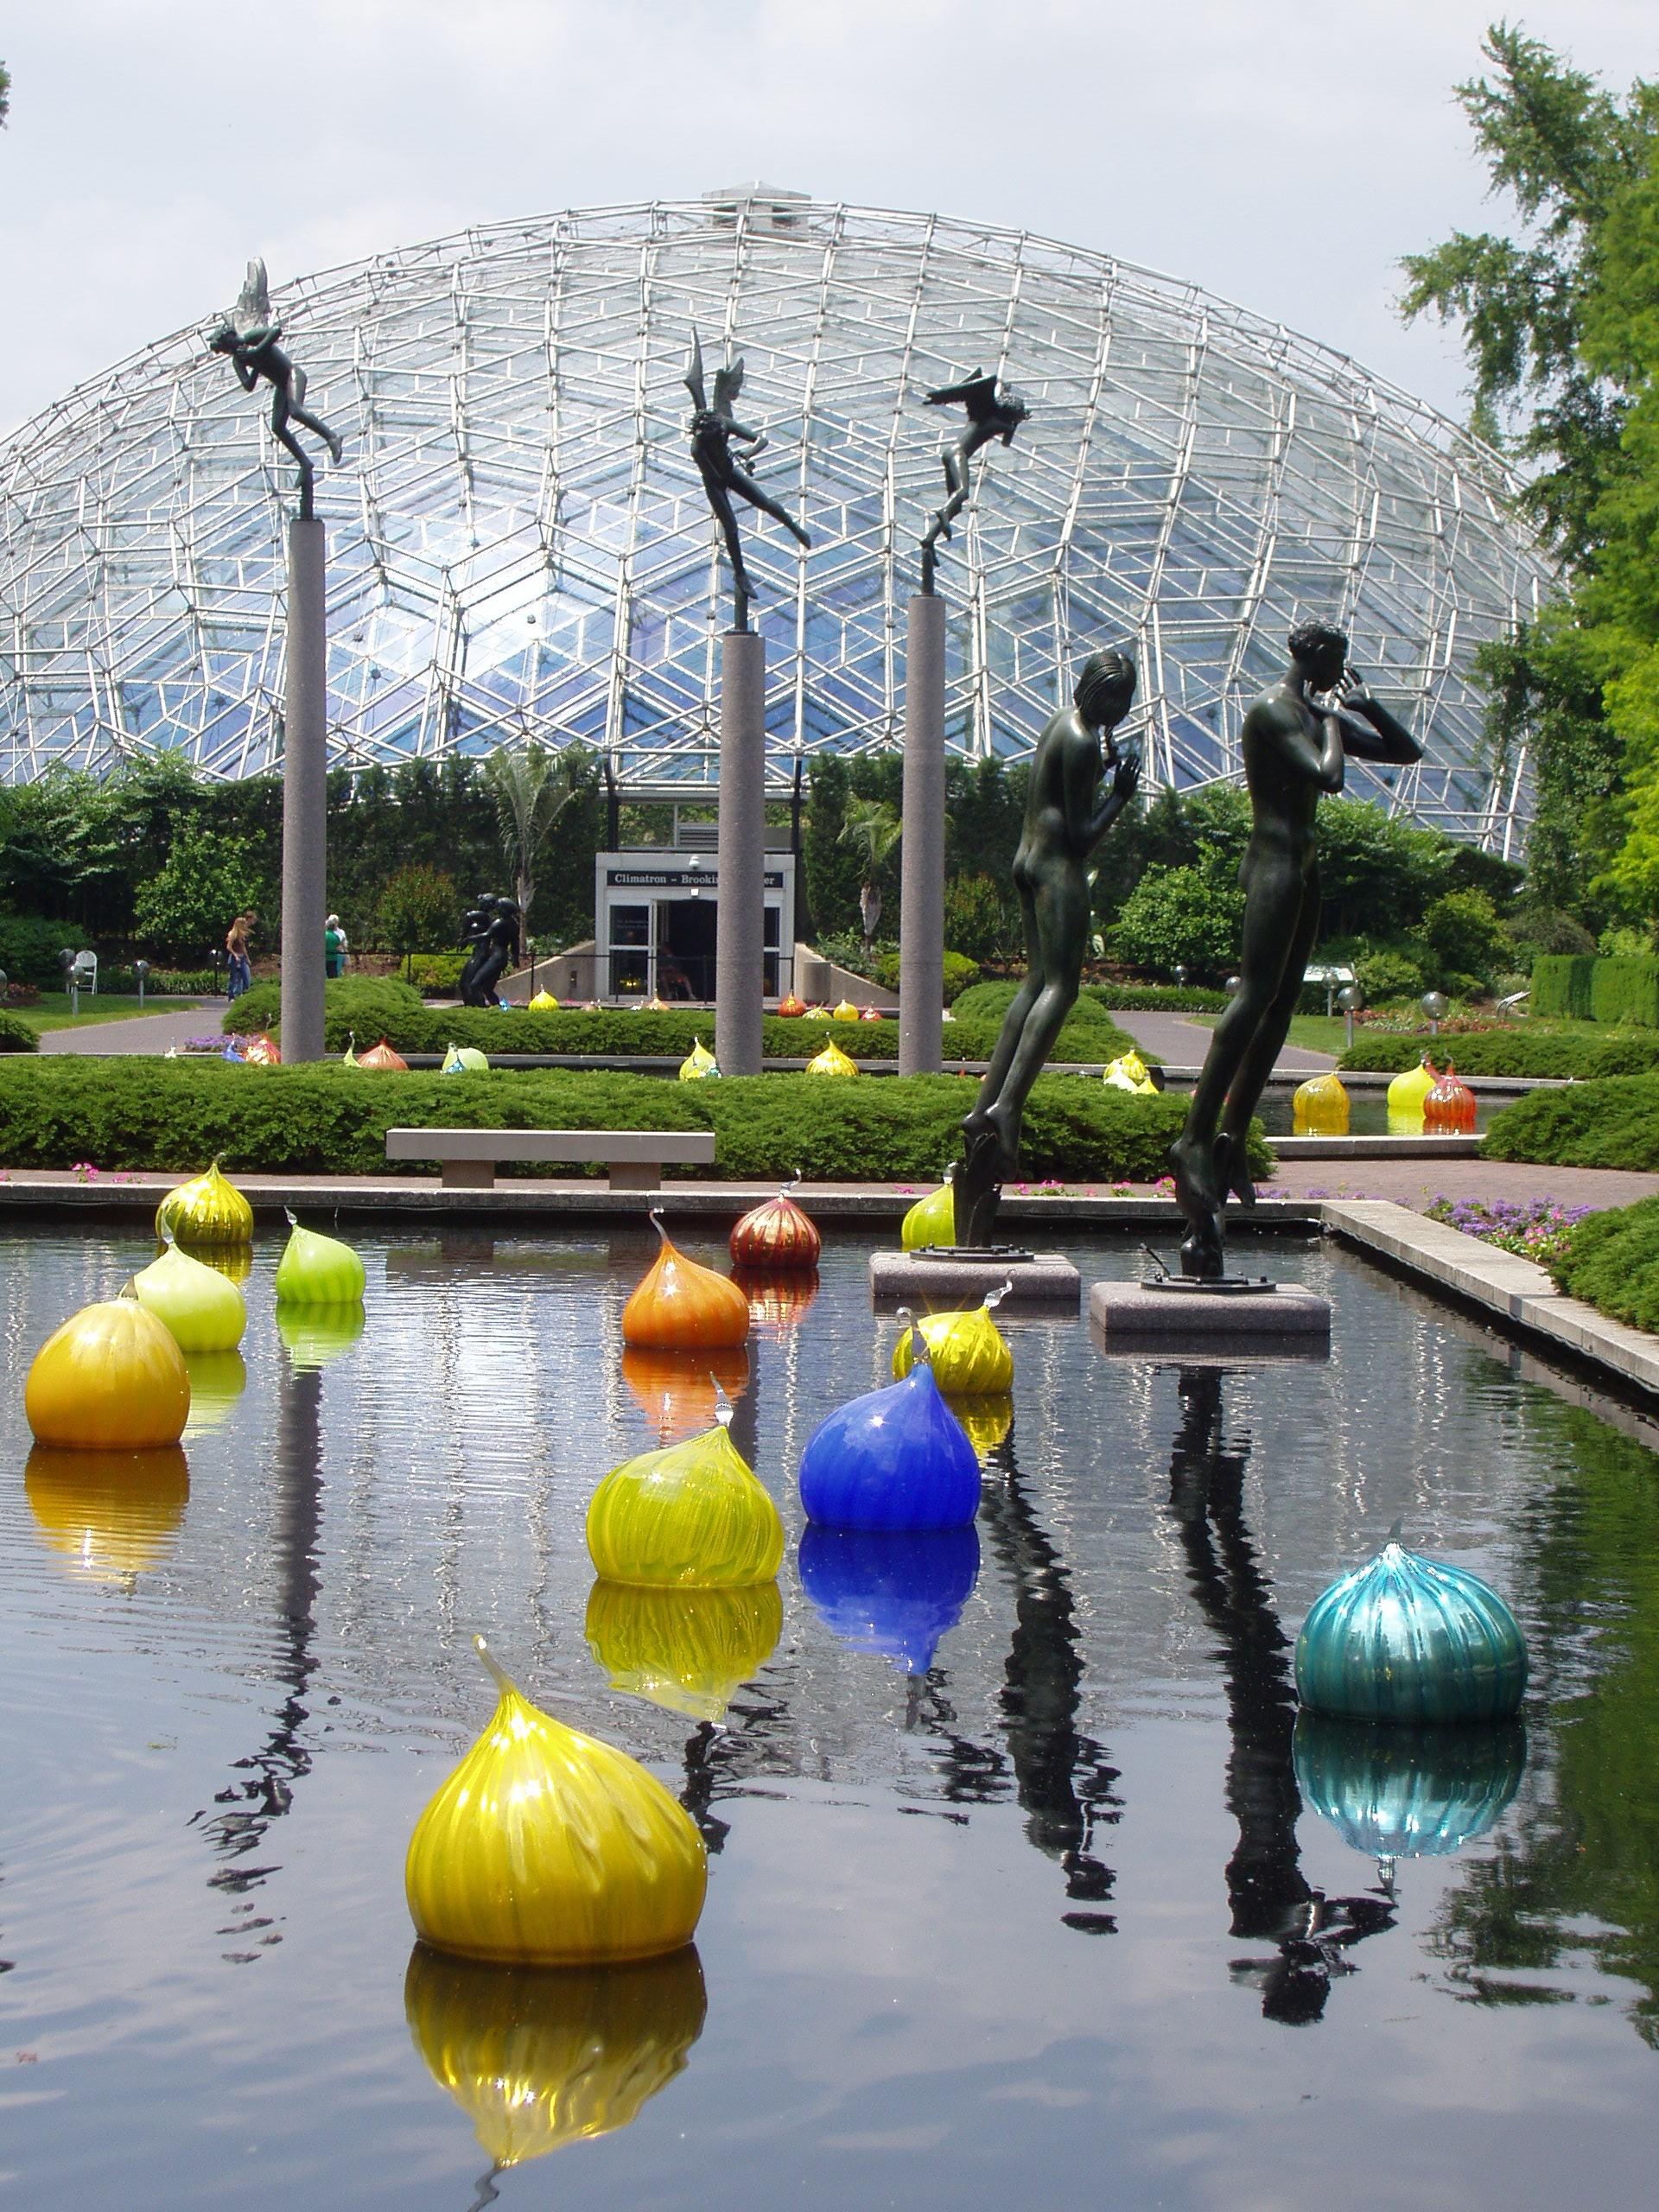 FileMissouri Botanical Garden Climatron with artworks by Dale